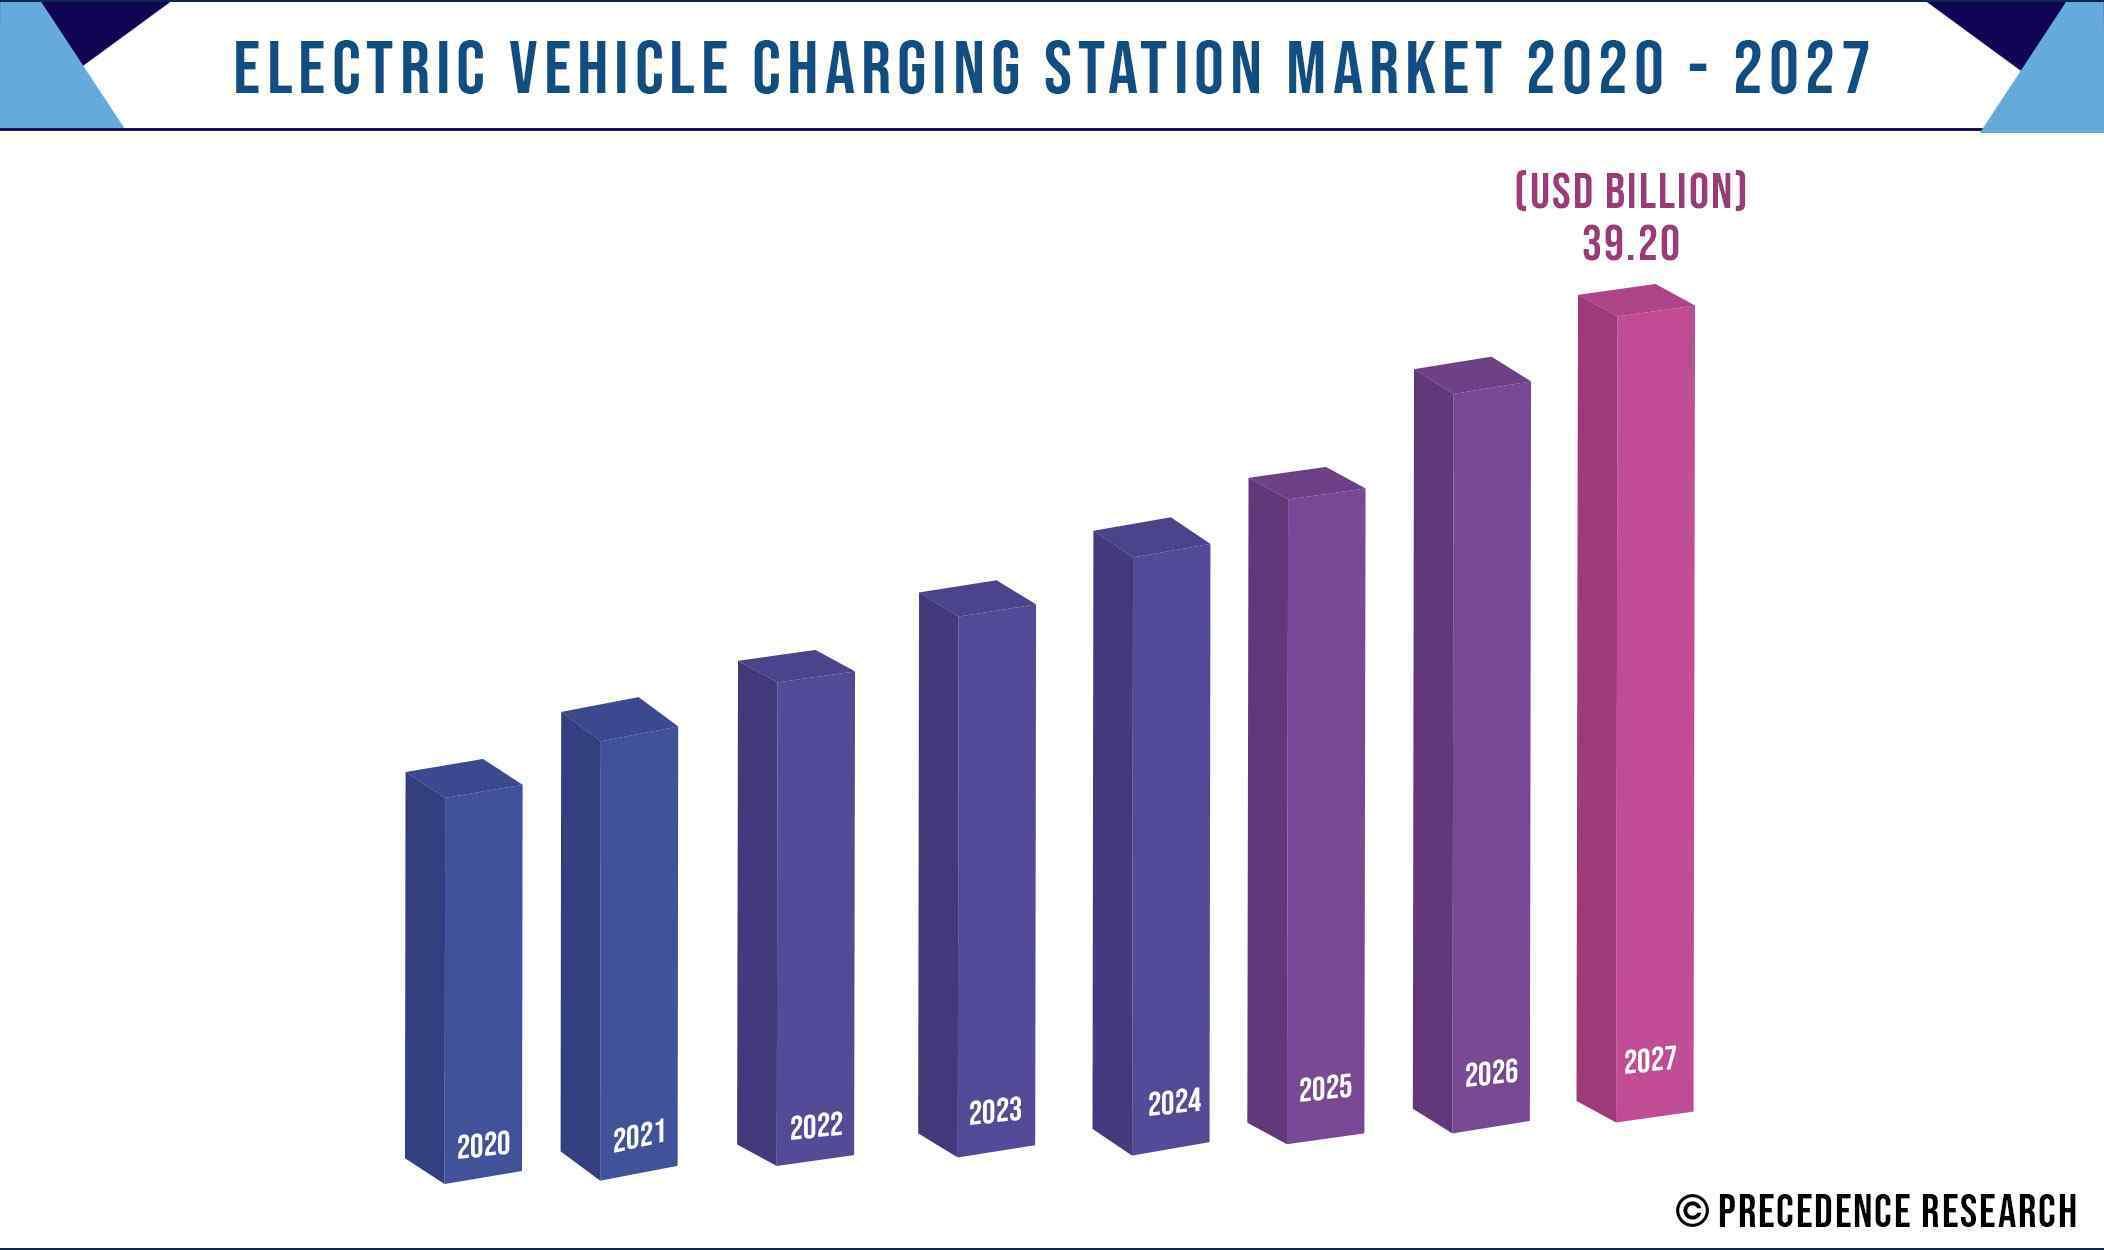 Electric Vehicle Charging Station Market Size 2020-2027